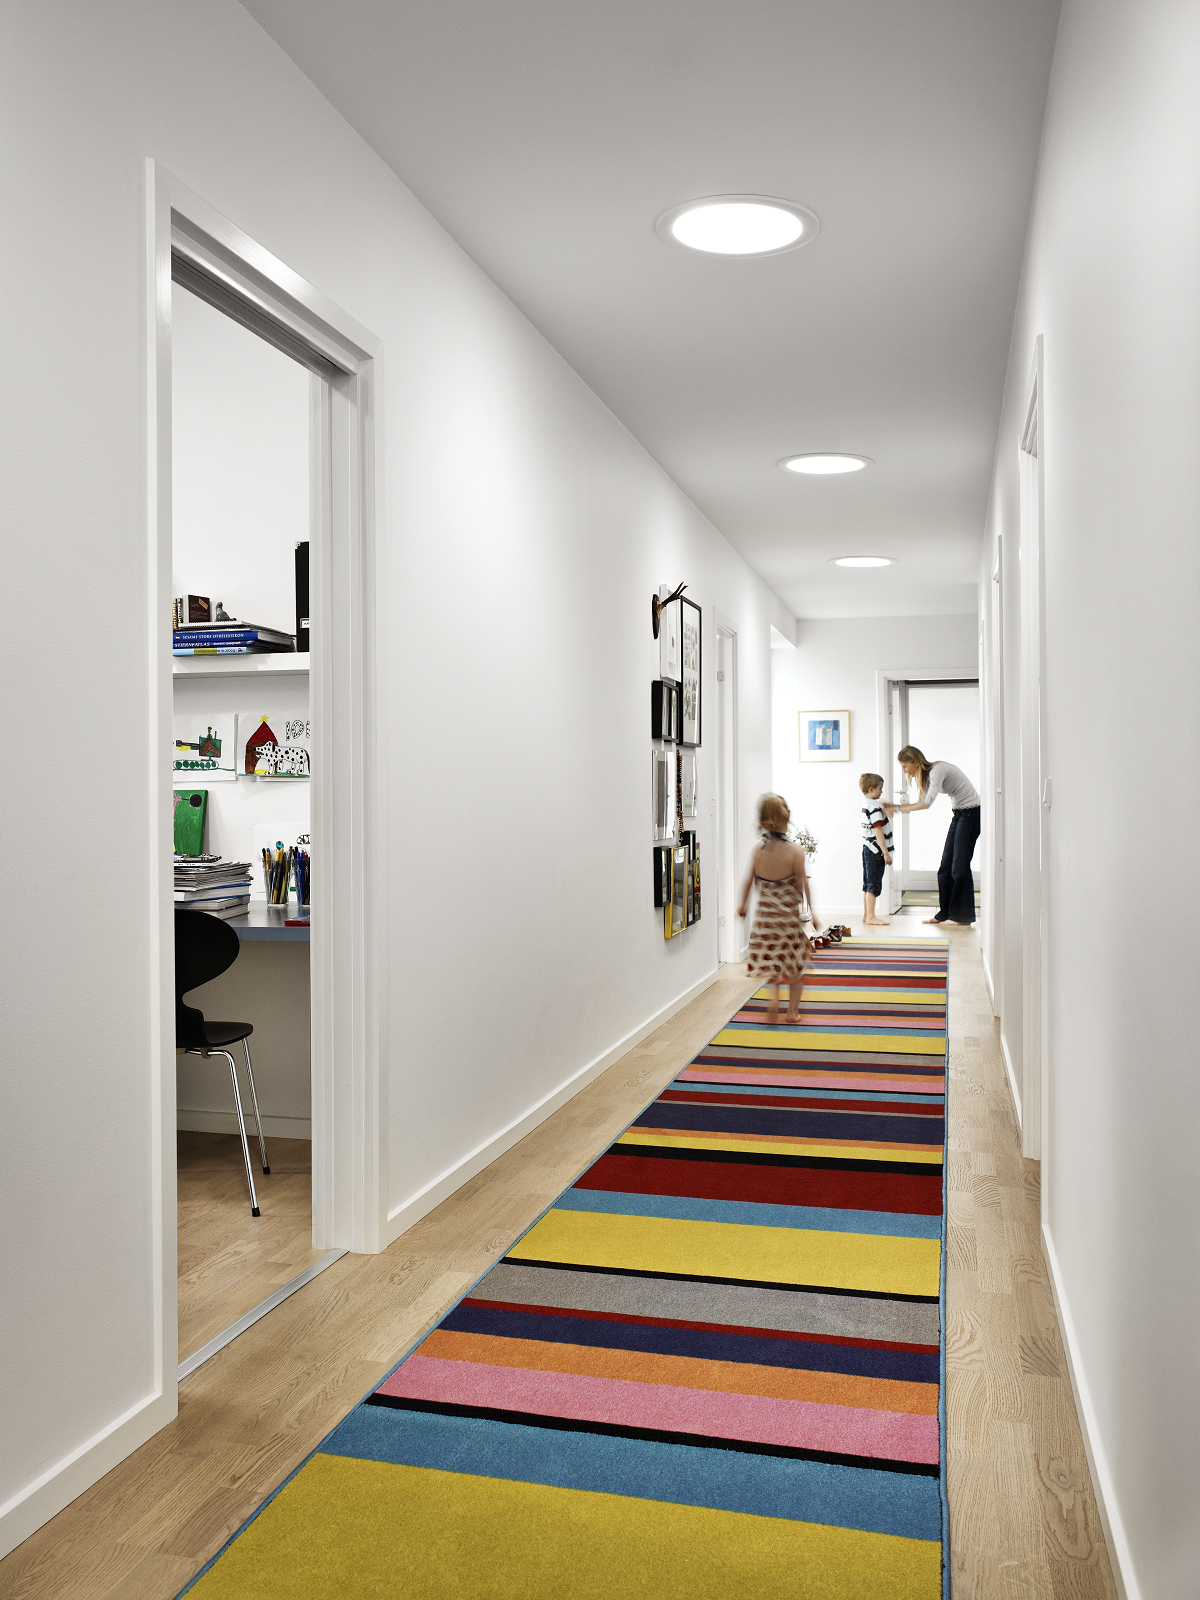 Narrow hallway lighting ideas  Pin by Top Home Decor Design Ideas on Hallway ideas  Pinterest